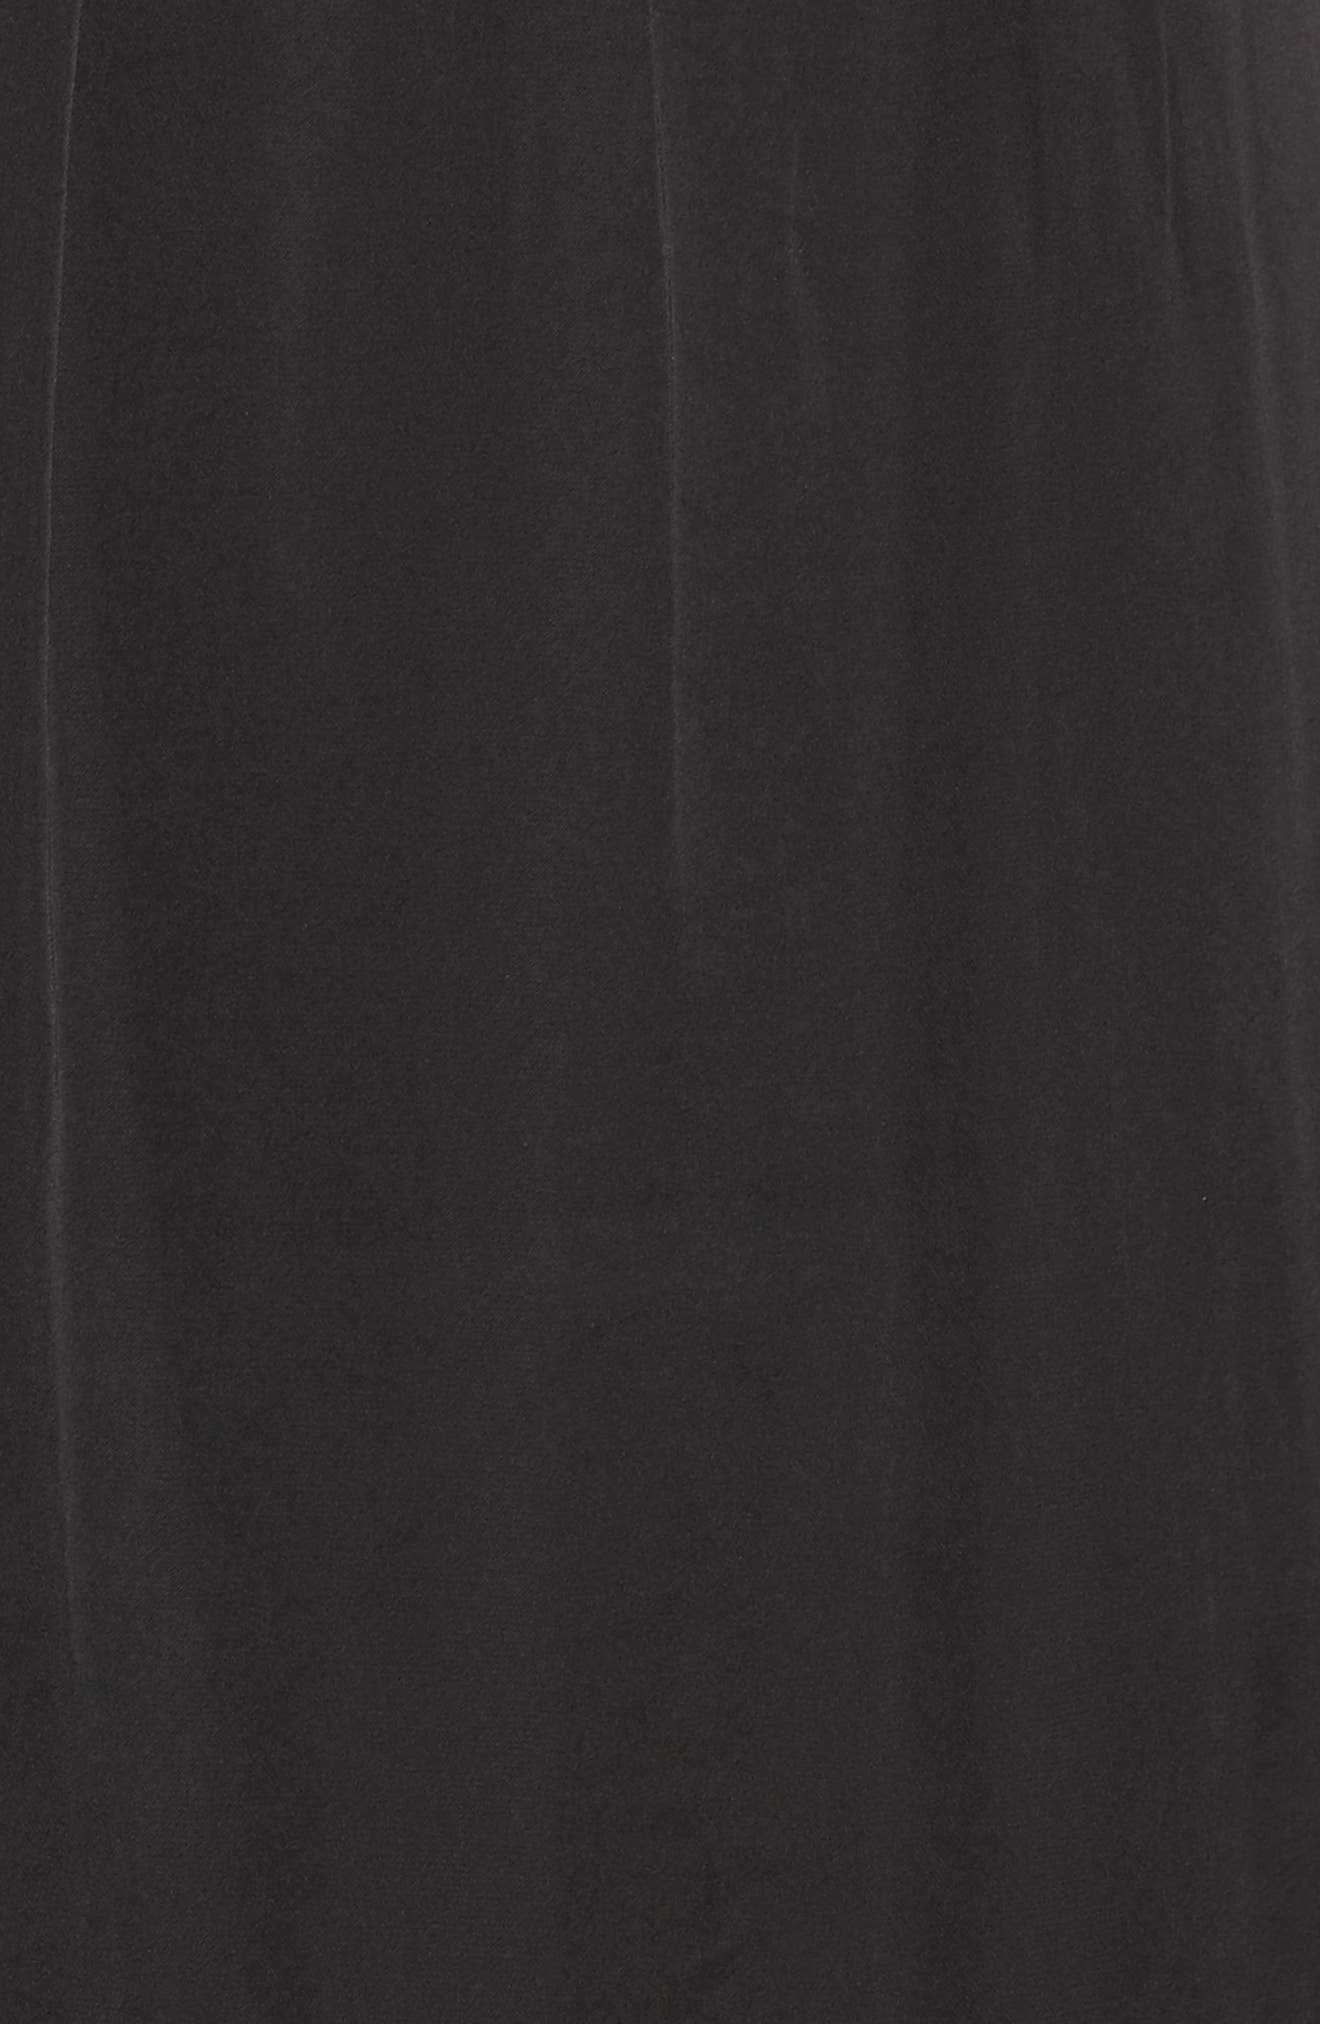 Split Sleeve Dress,                             Alternate thumbnail 5, color,                             Black